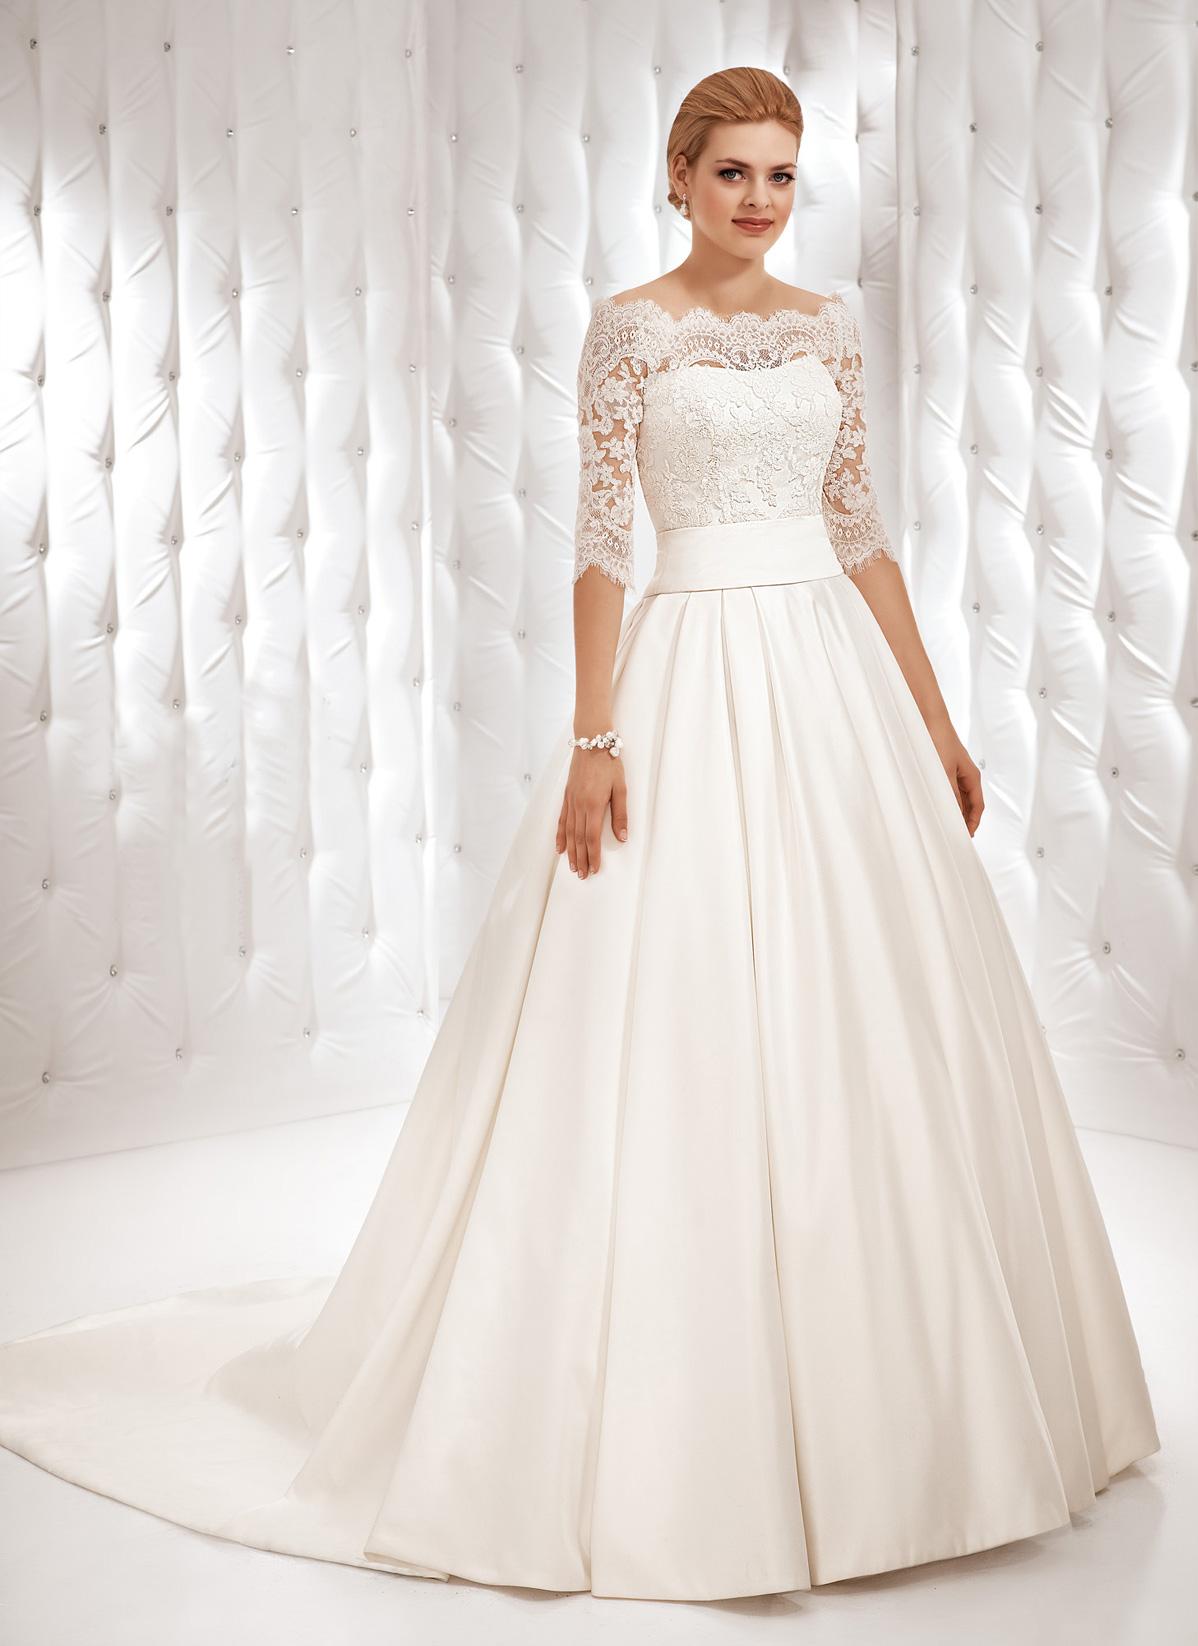 Herm&#8217;s Bridal <br> Marsala